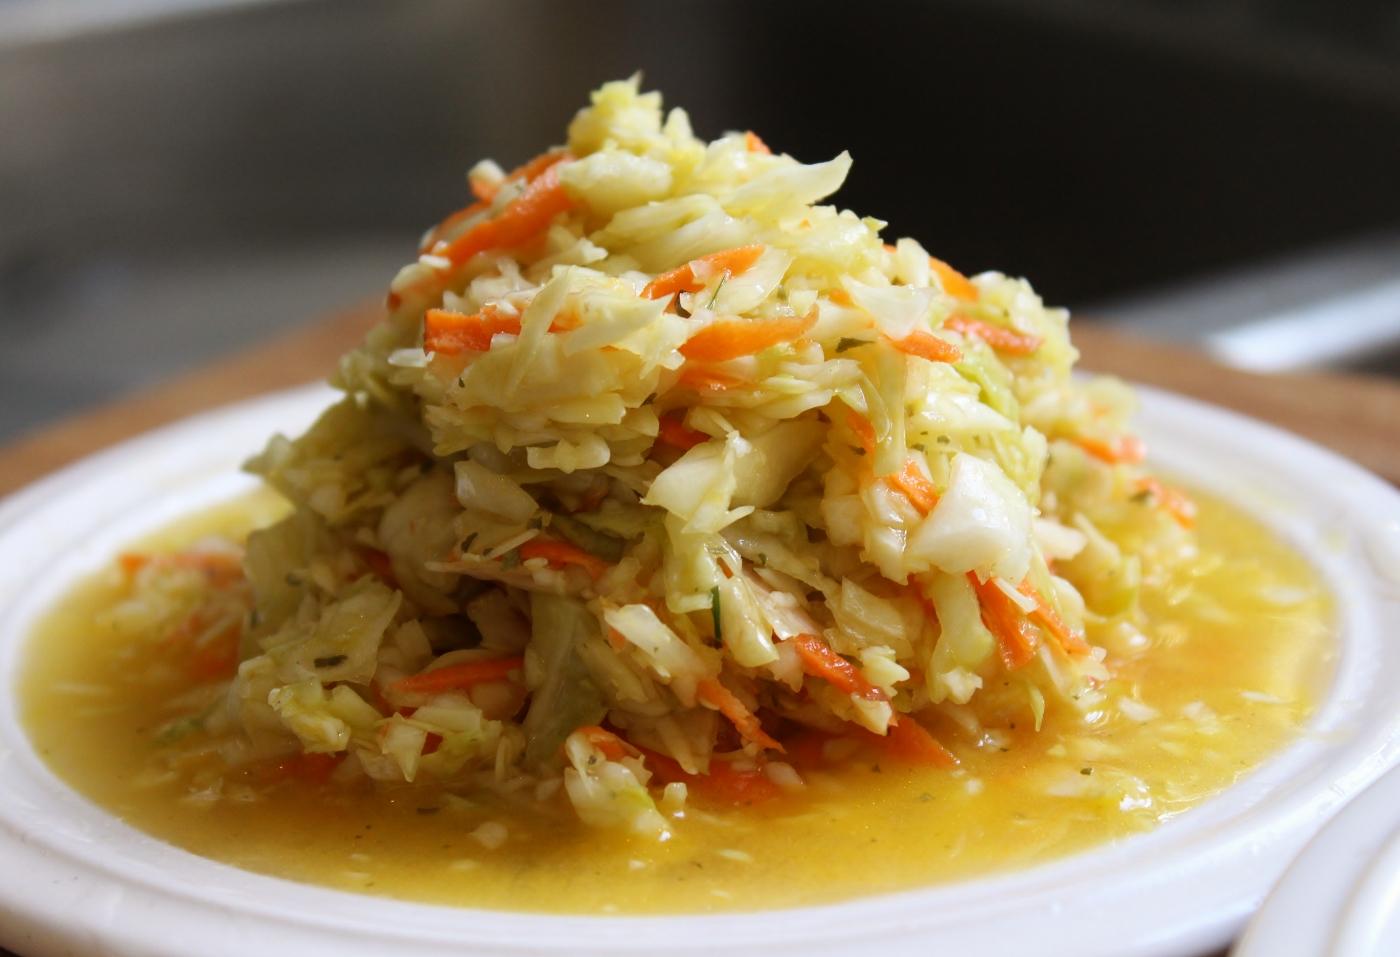 salade de chou vegan bailey 2 (1400x957)